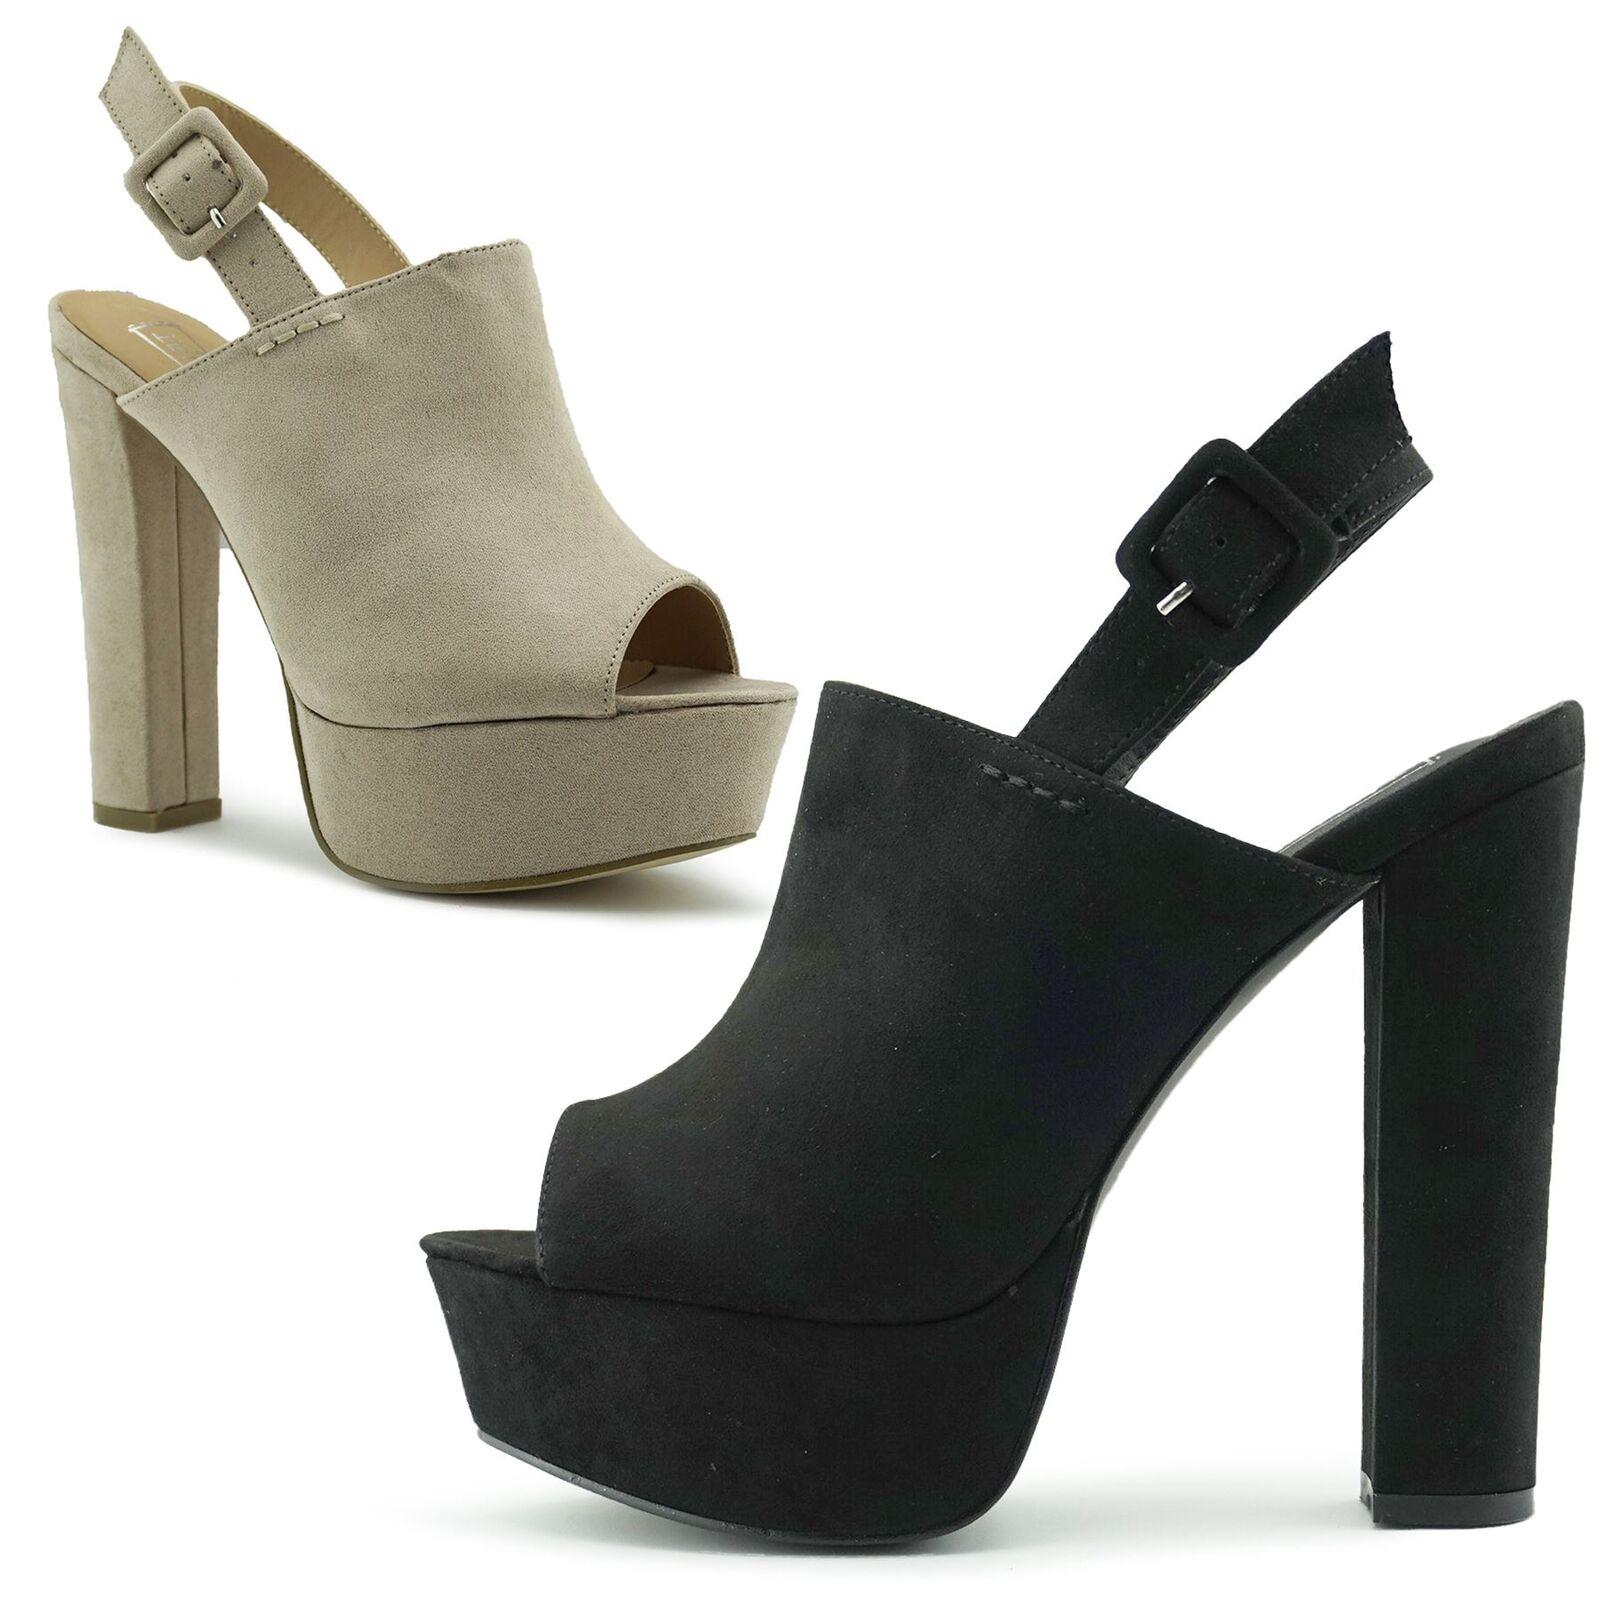 78aa601b479 New Women's Cleated Platform shoes Platform Peep High Heel Toe ...